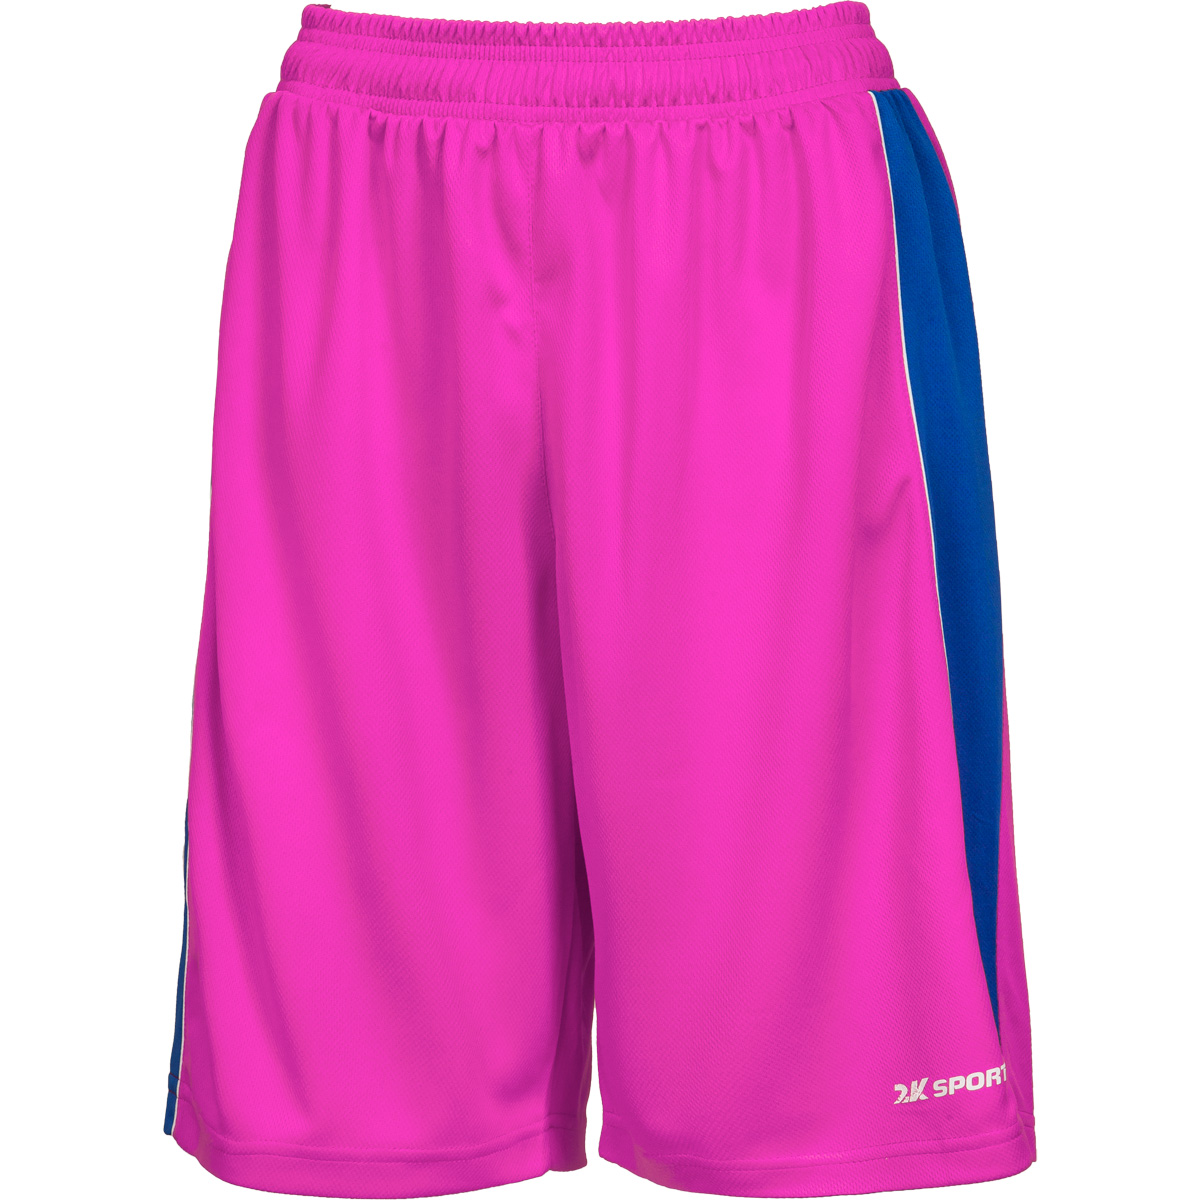 Шорты баскетбольные женские 2K Sport Advance, цвет: пурпурный, синий, белый. 130033. Размер XS (40/42) - Баскетбол